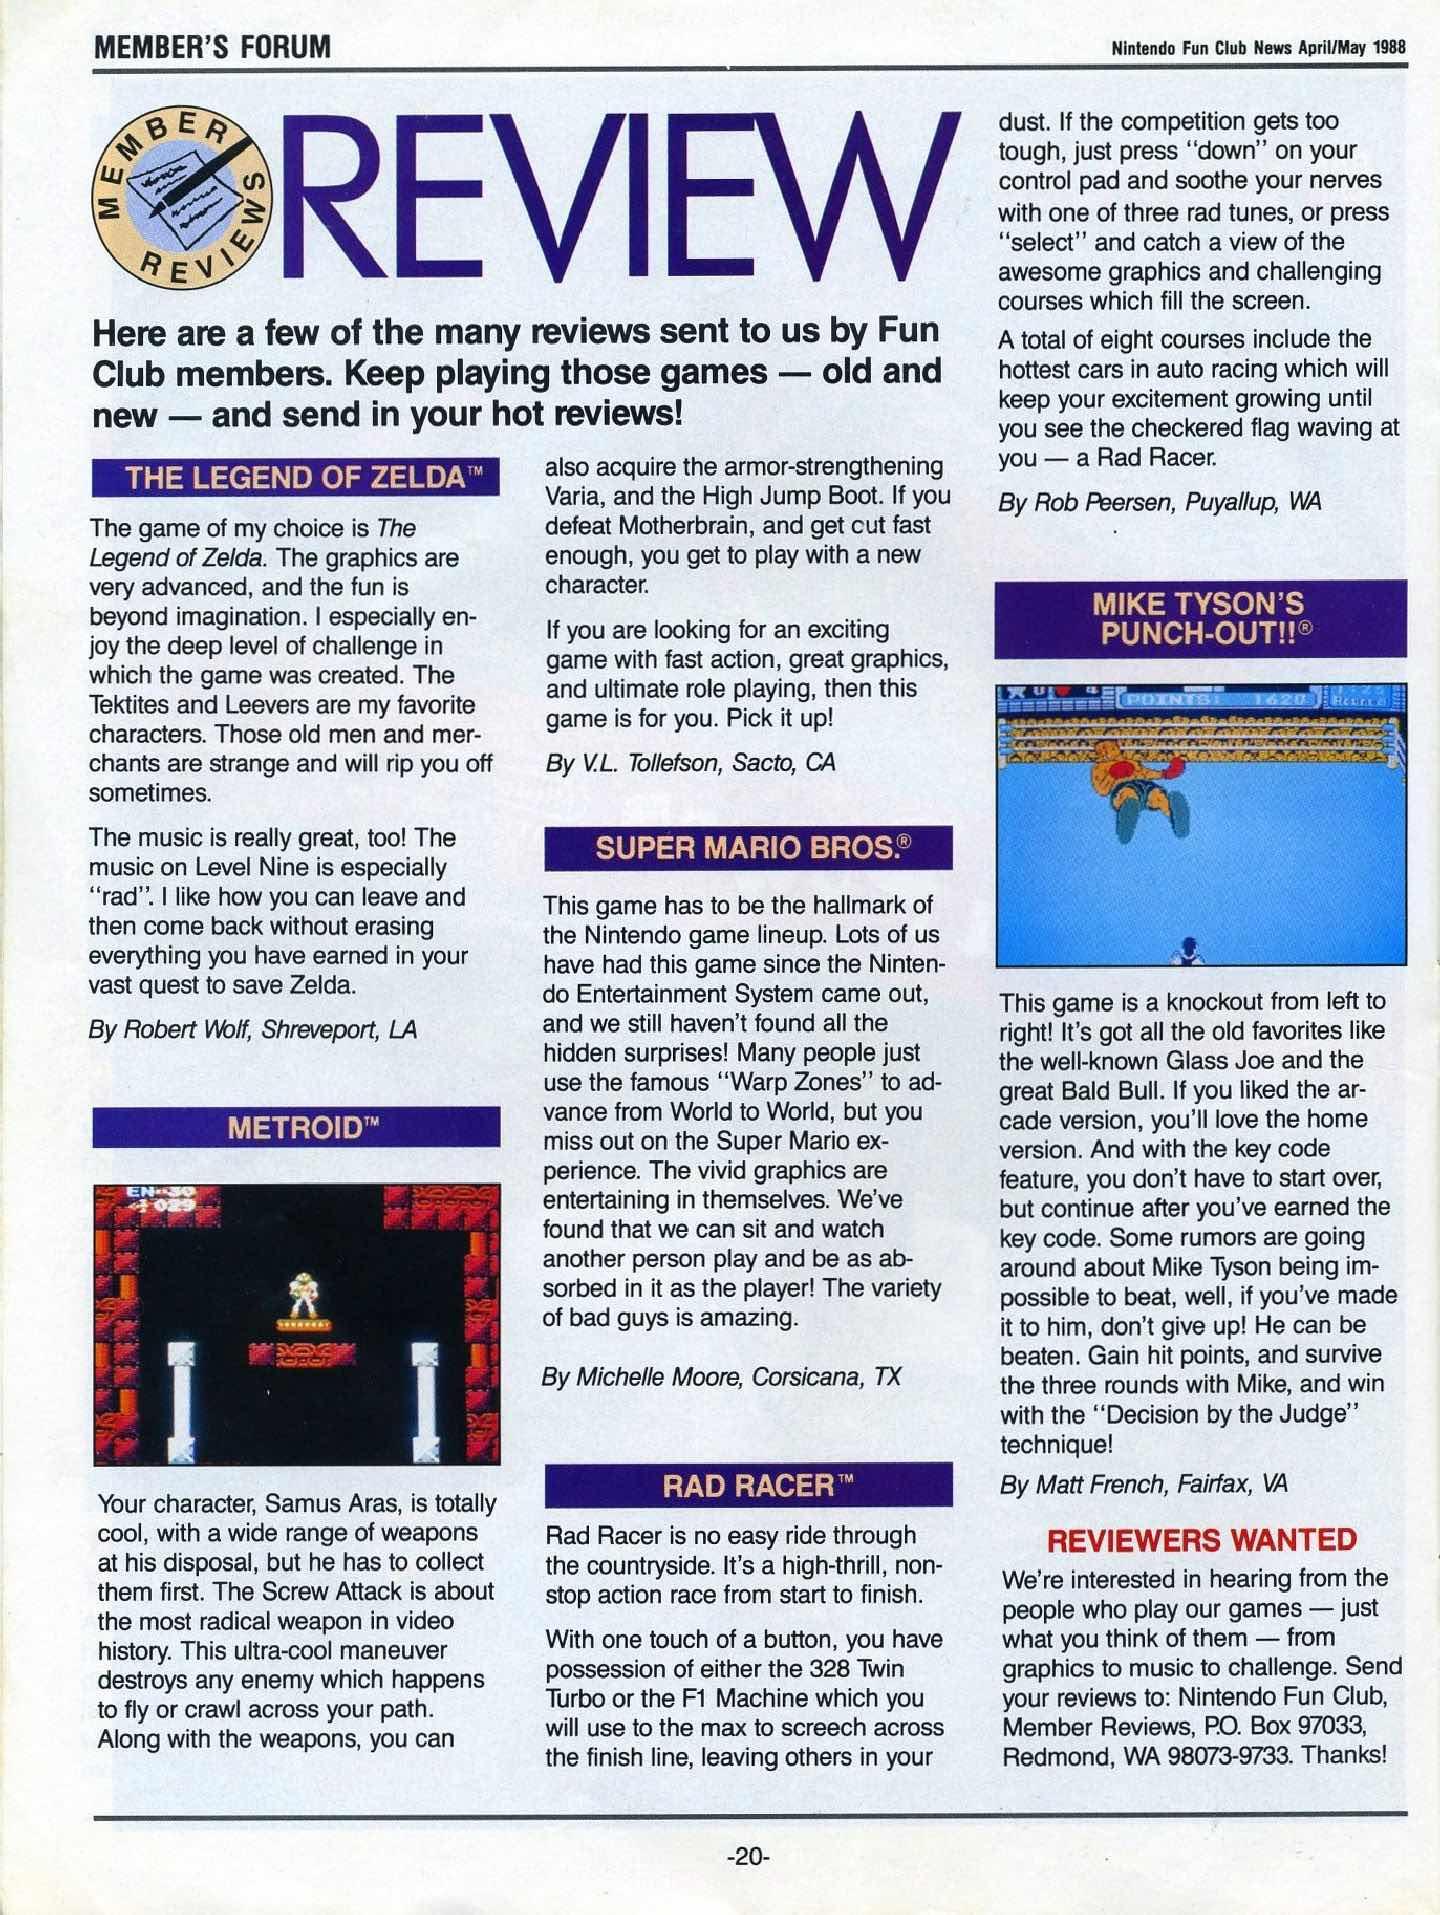 Nintendo Fun Club News April-May 1988 pg20